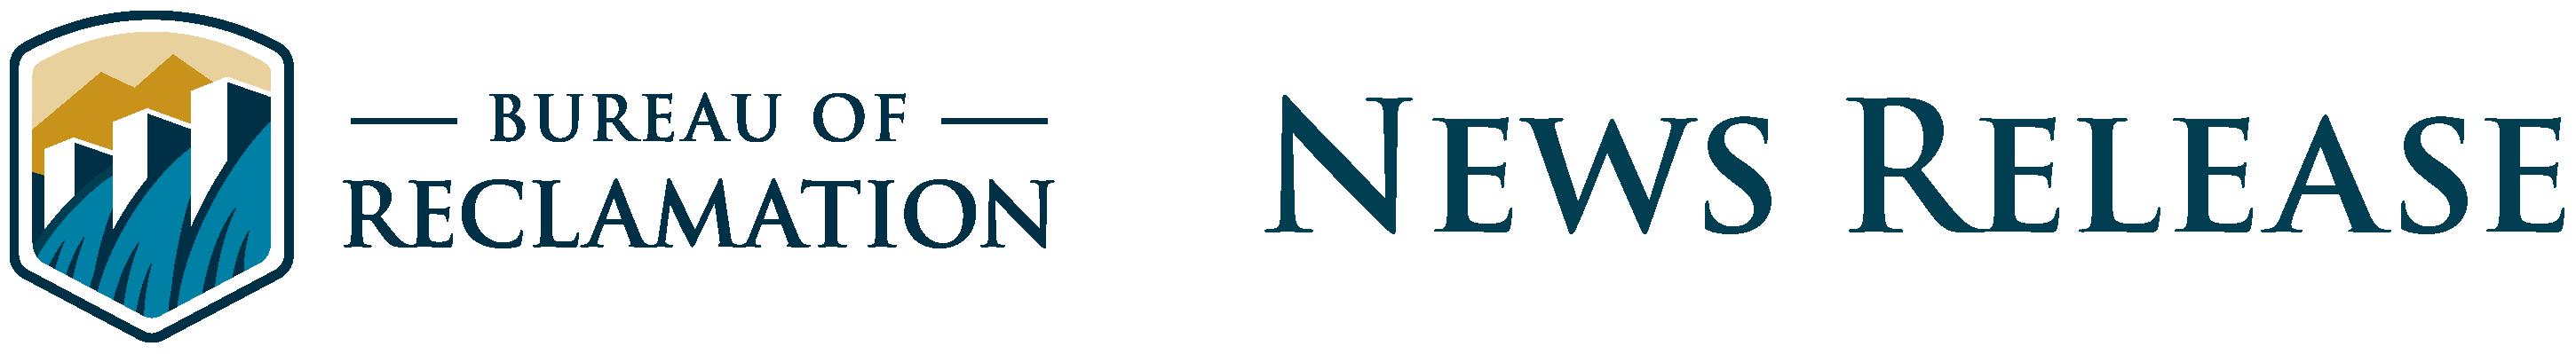 Bureau of Reclamation News Release Header